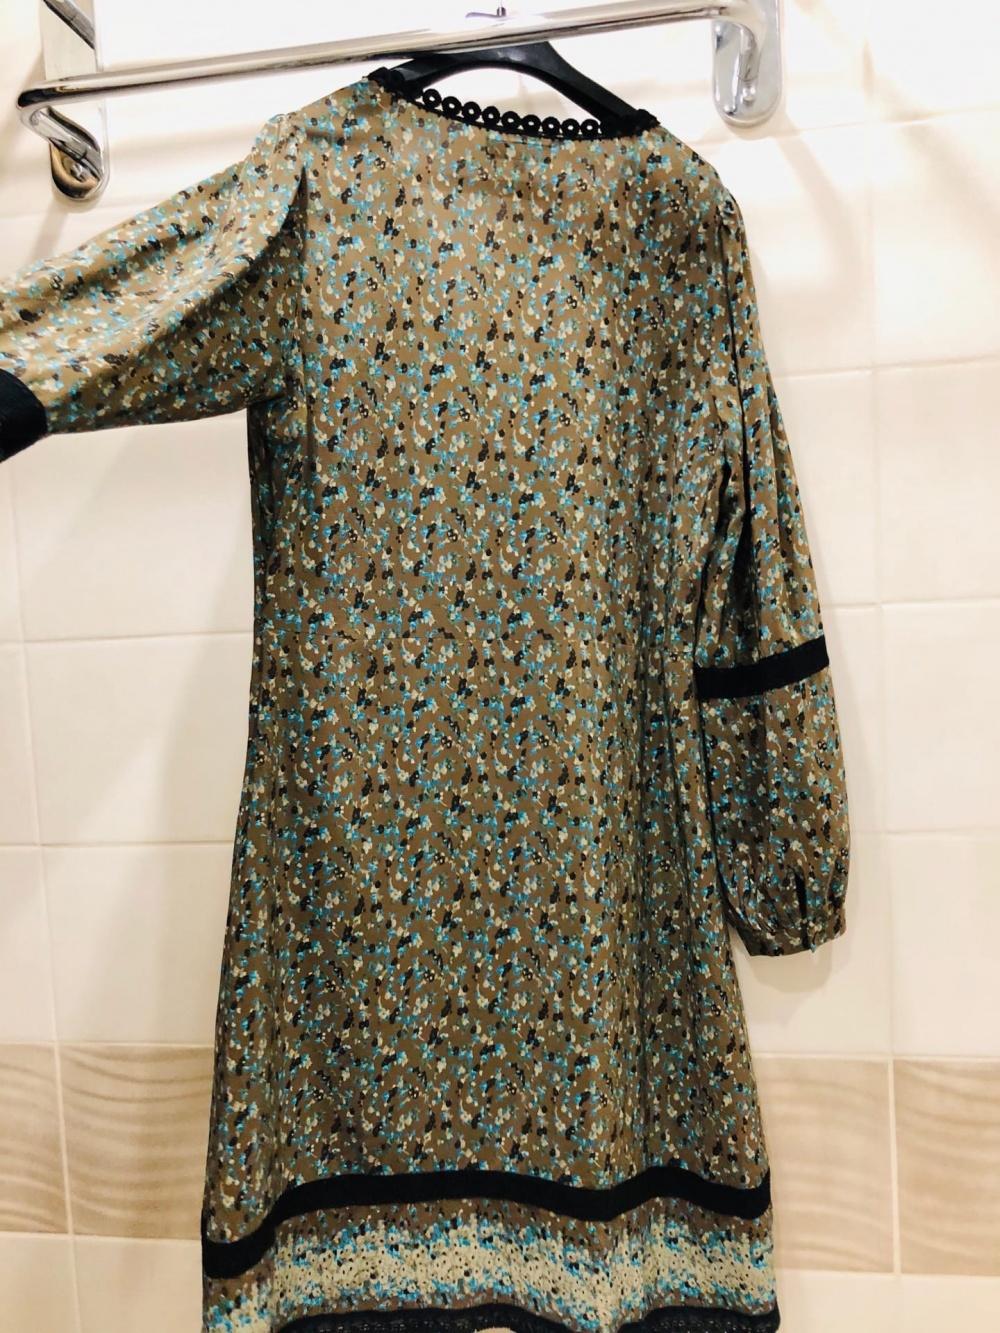 Платье Essentiel Antwerp.Размер 44-46.